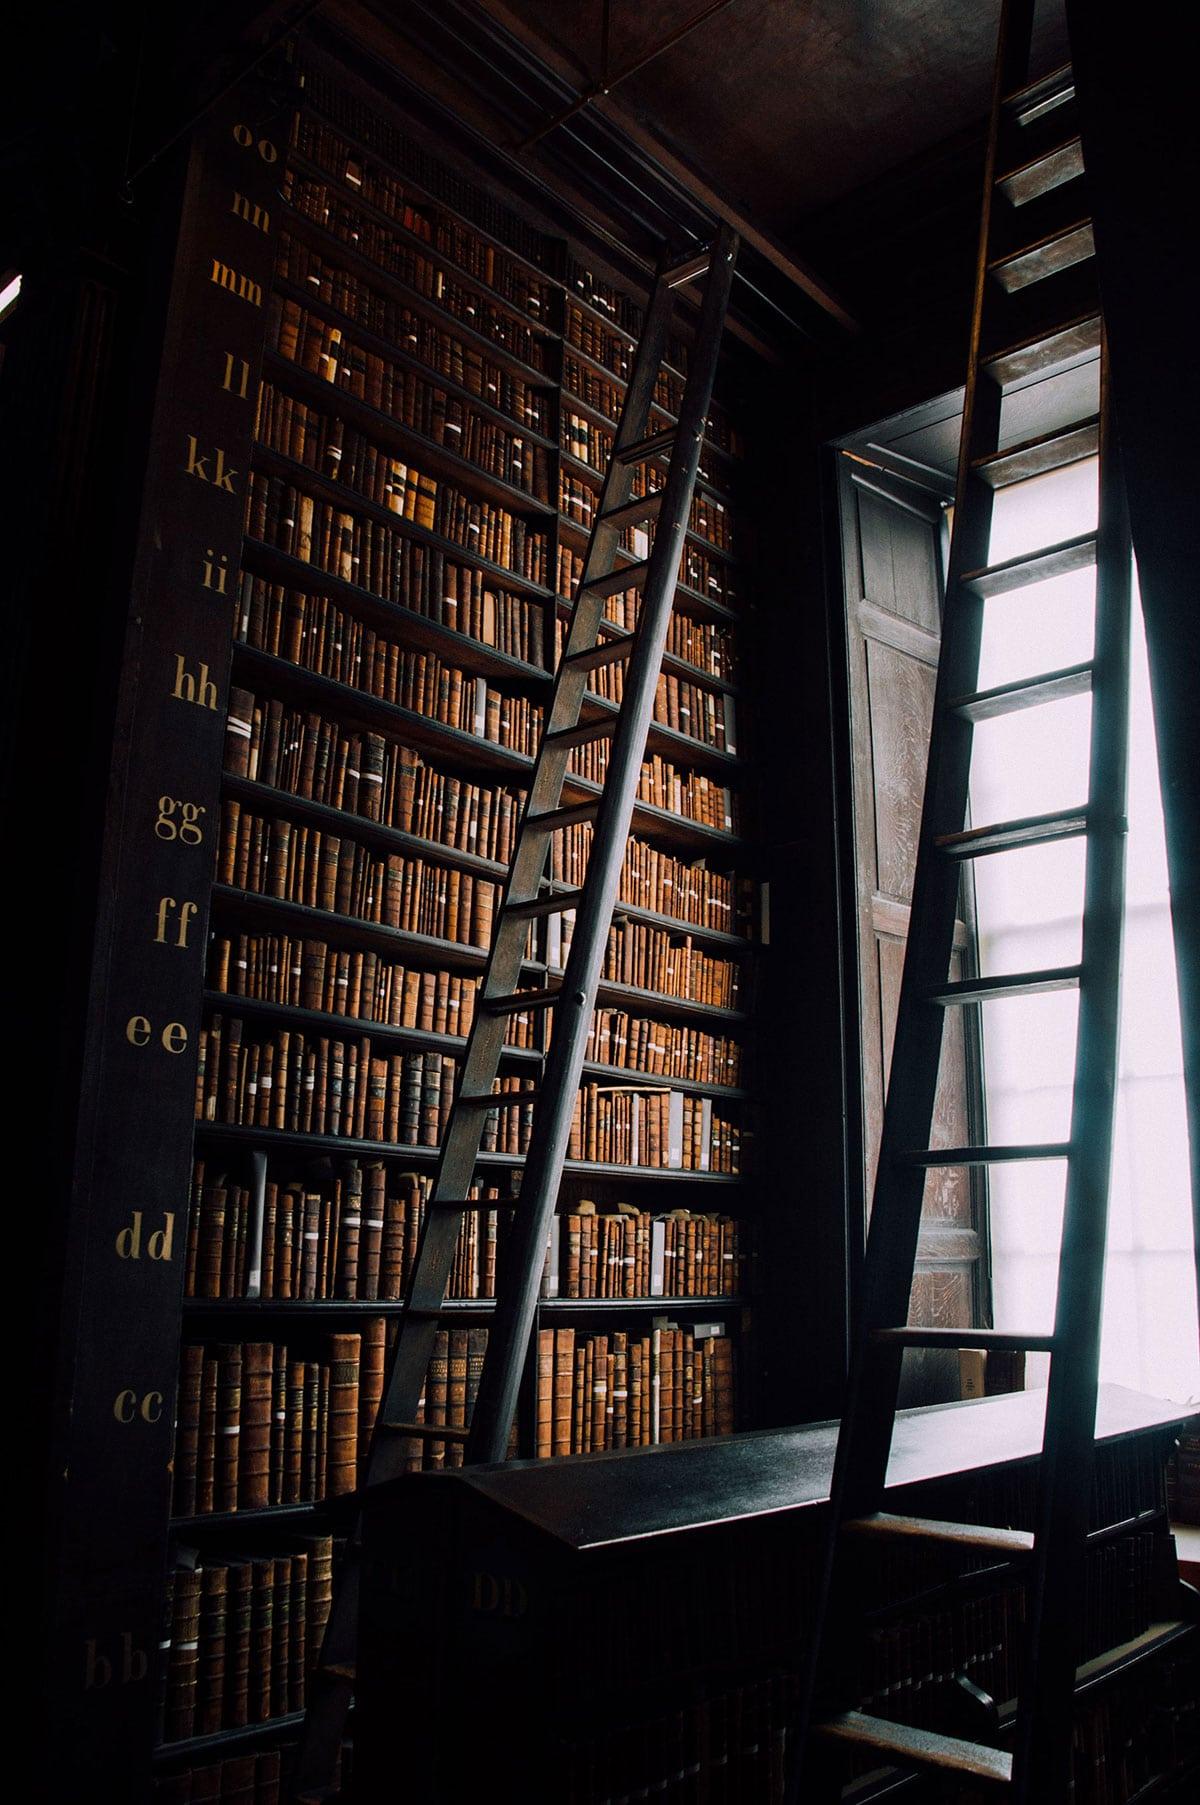 dublin_library_trinity_college_002